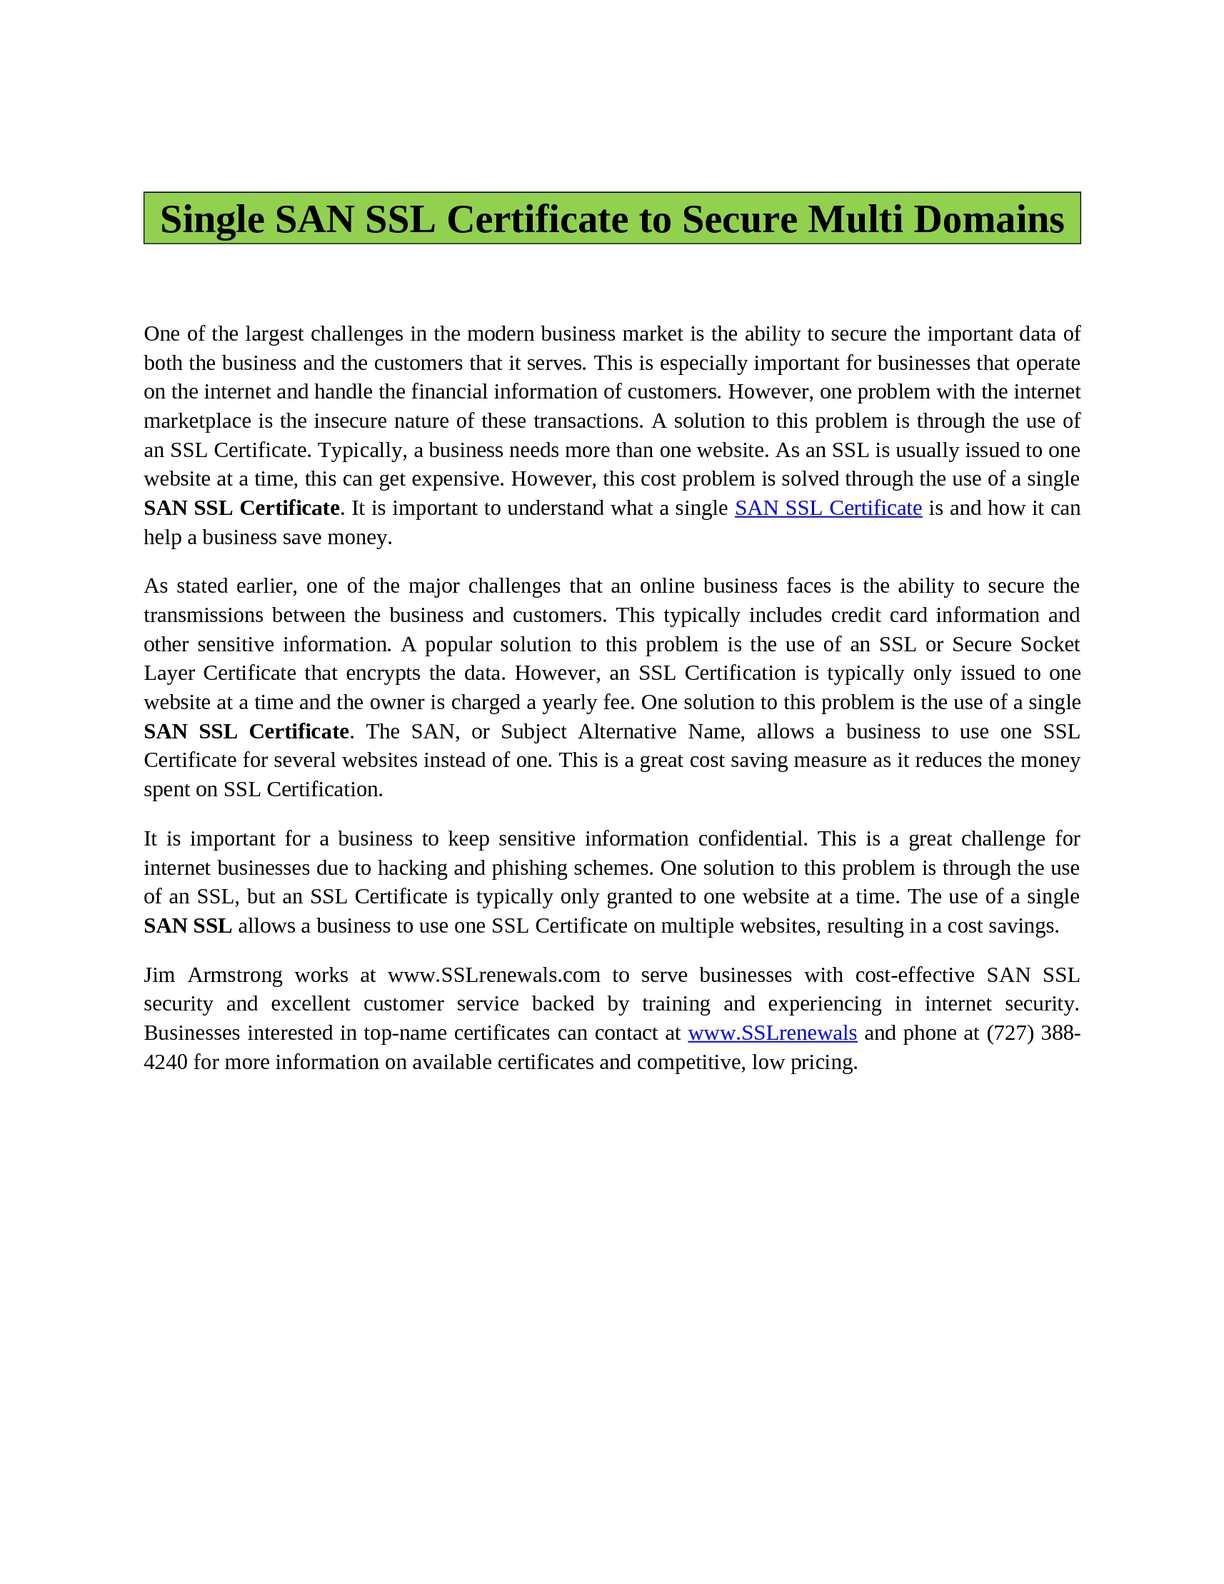 Calamo San Ssl Certificate